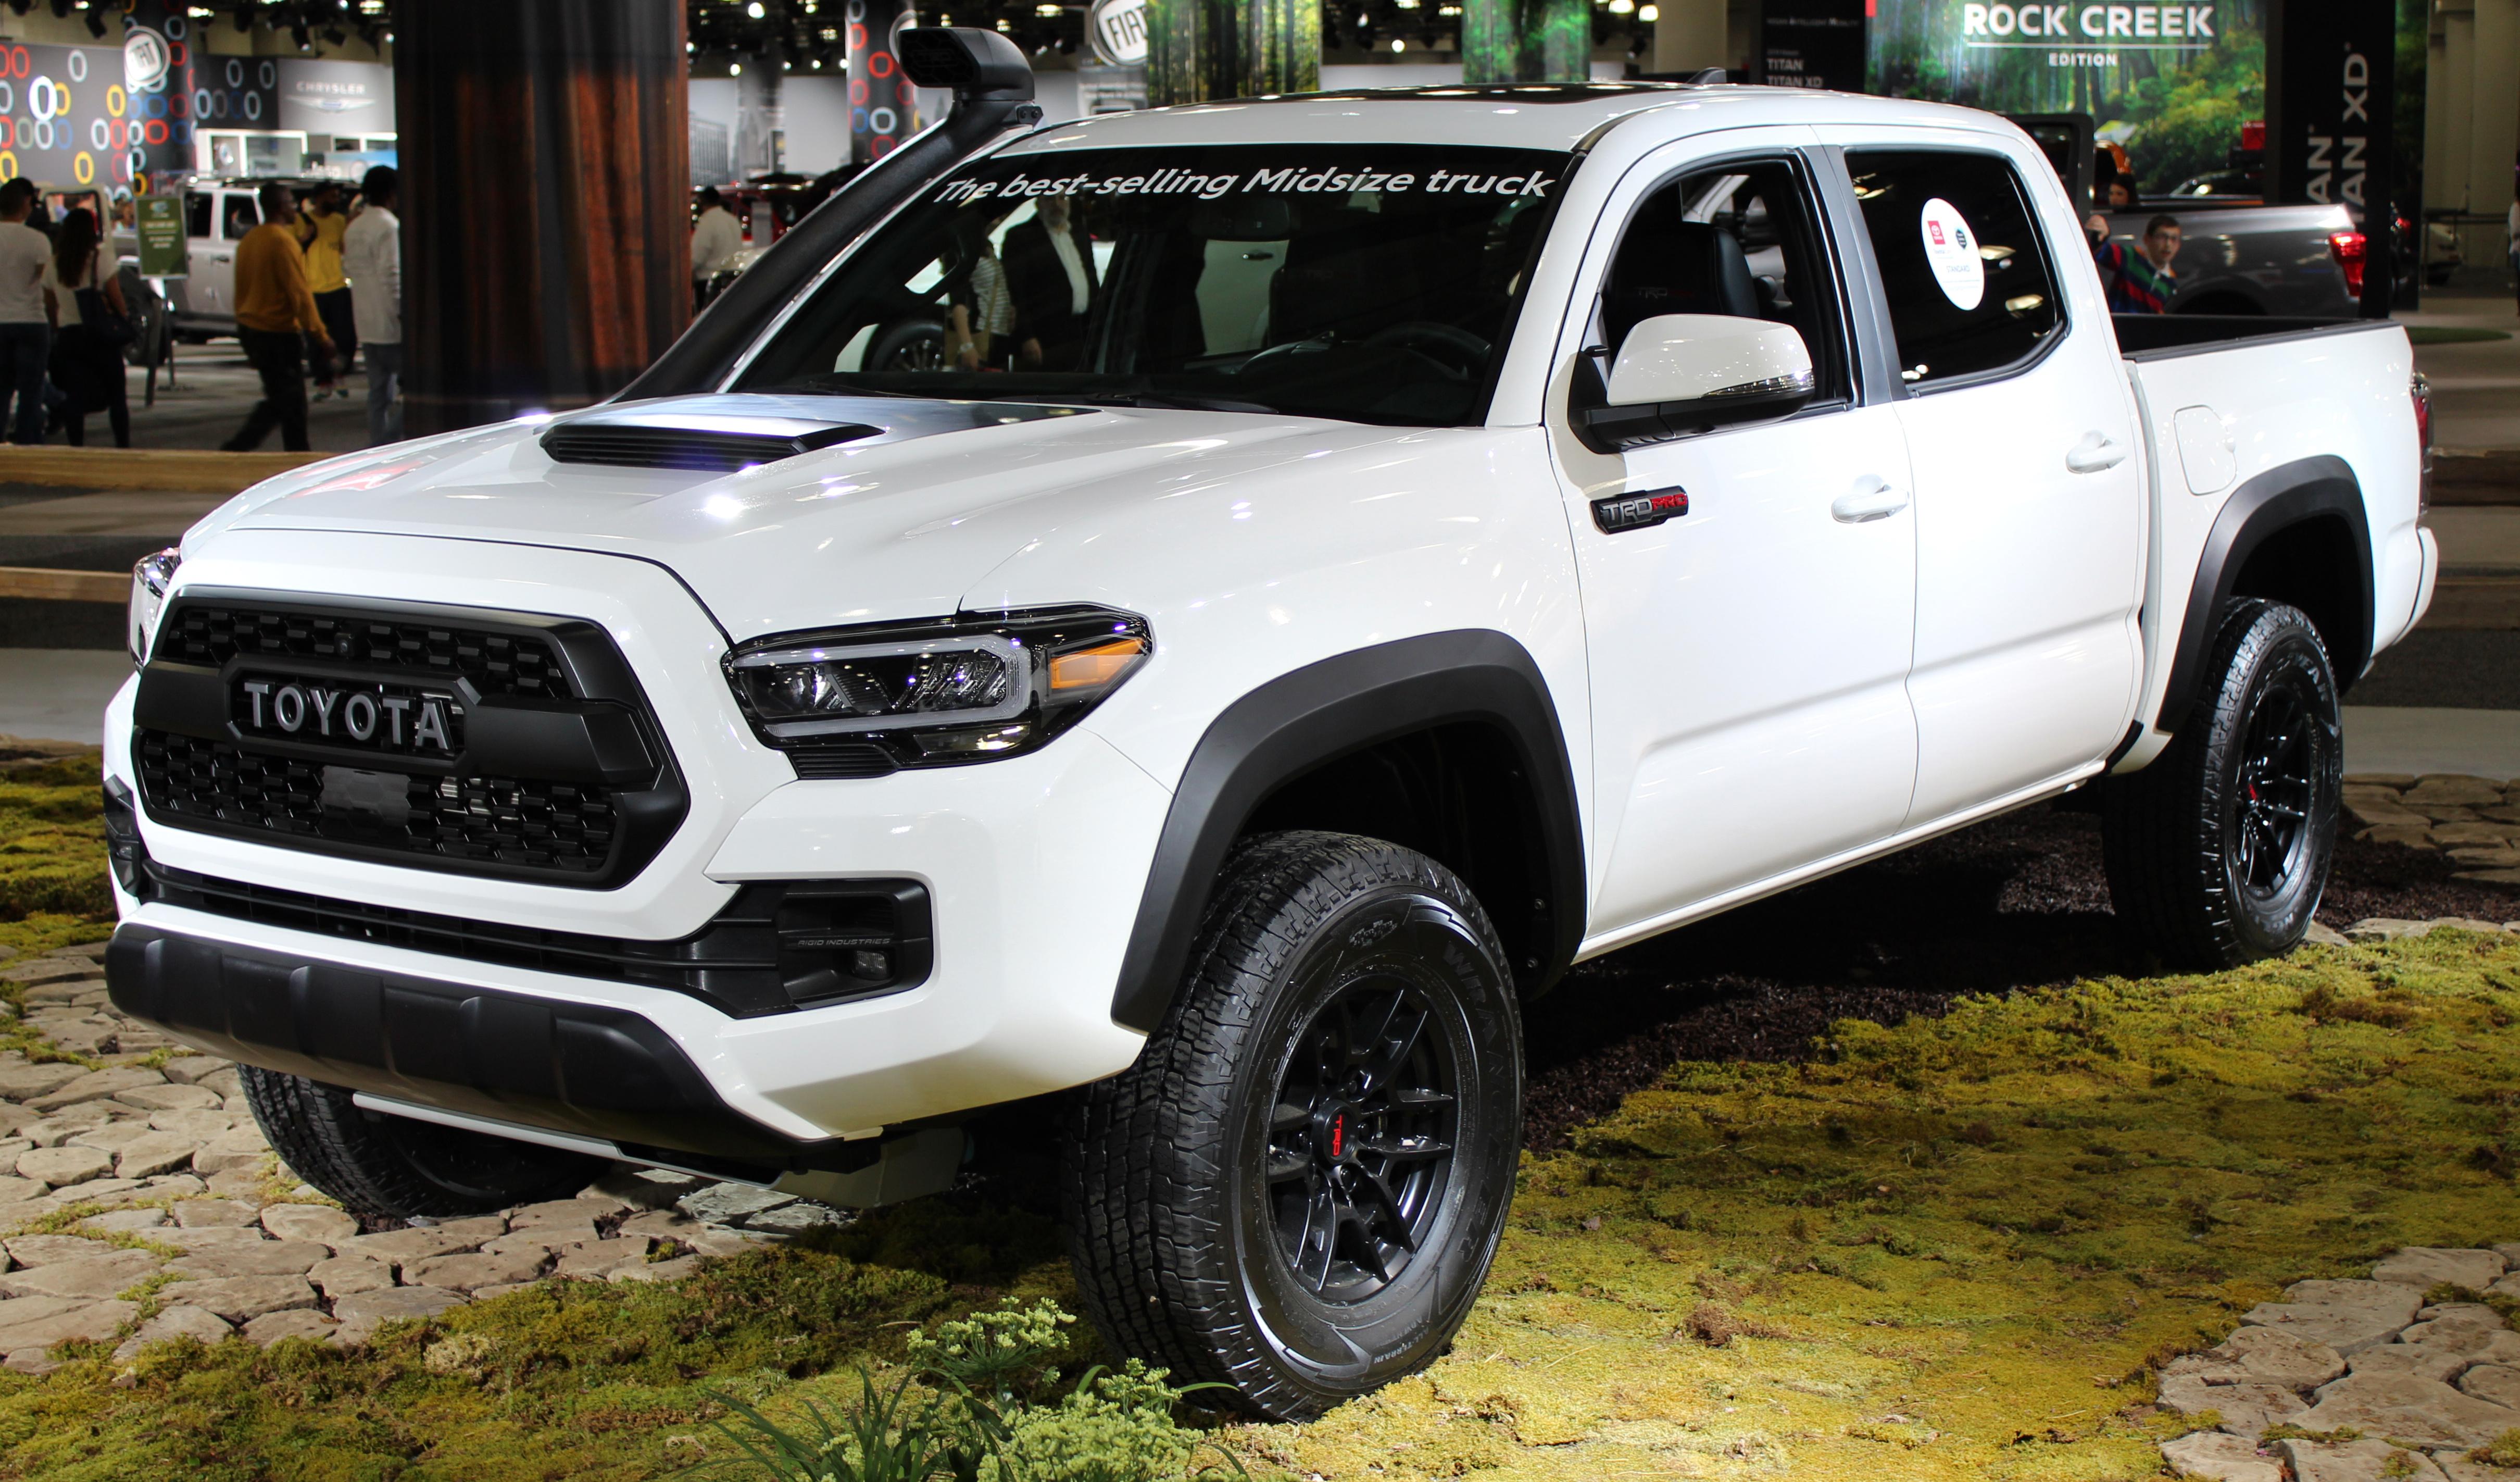 White Toyota Tacoma